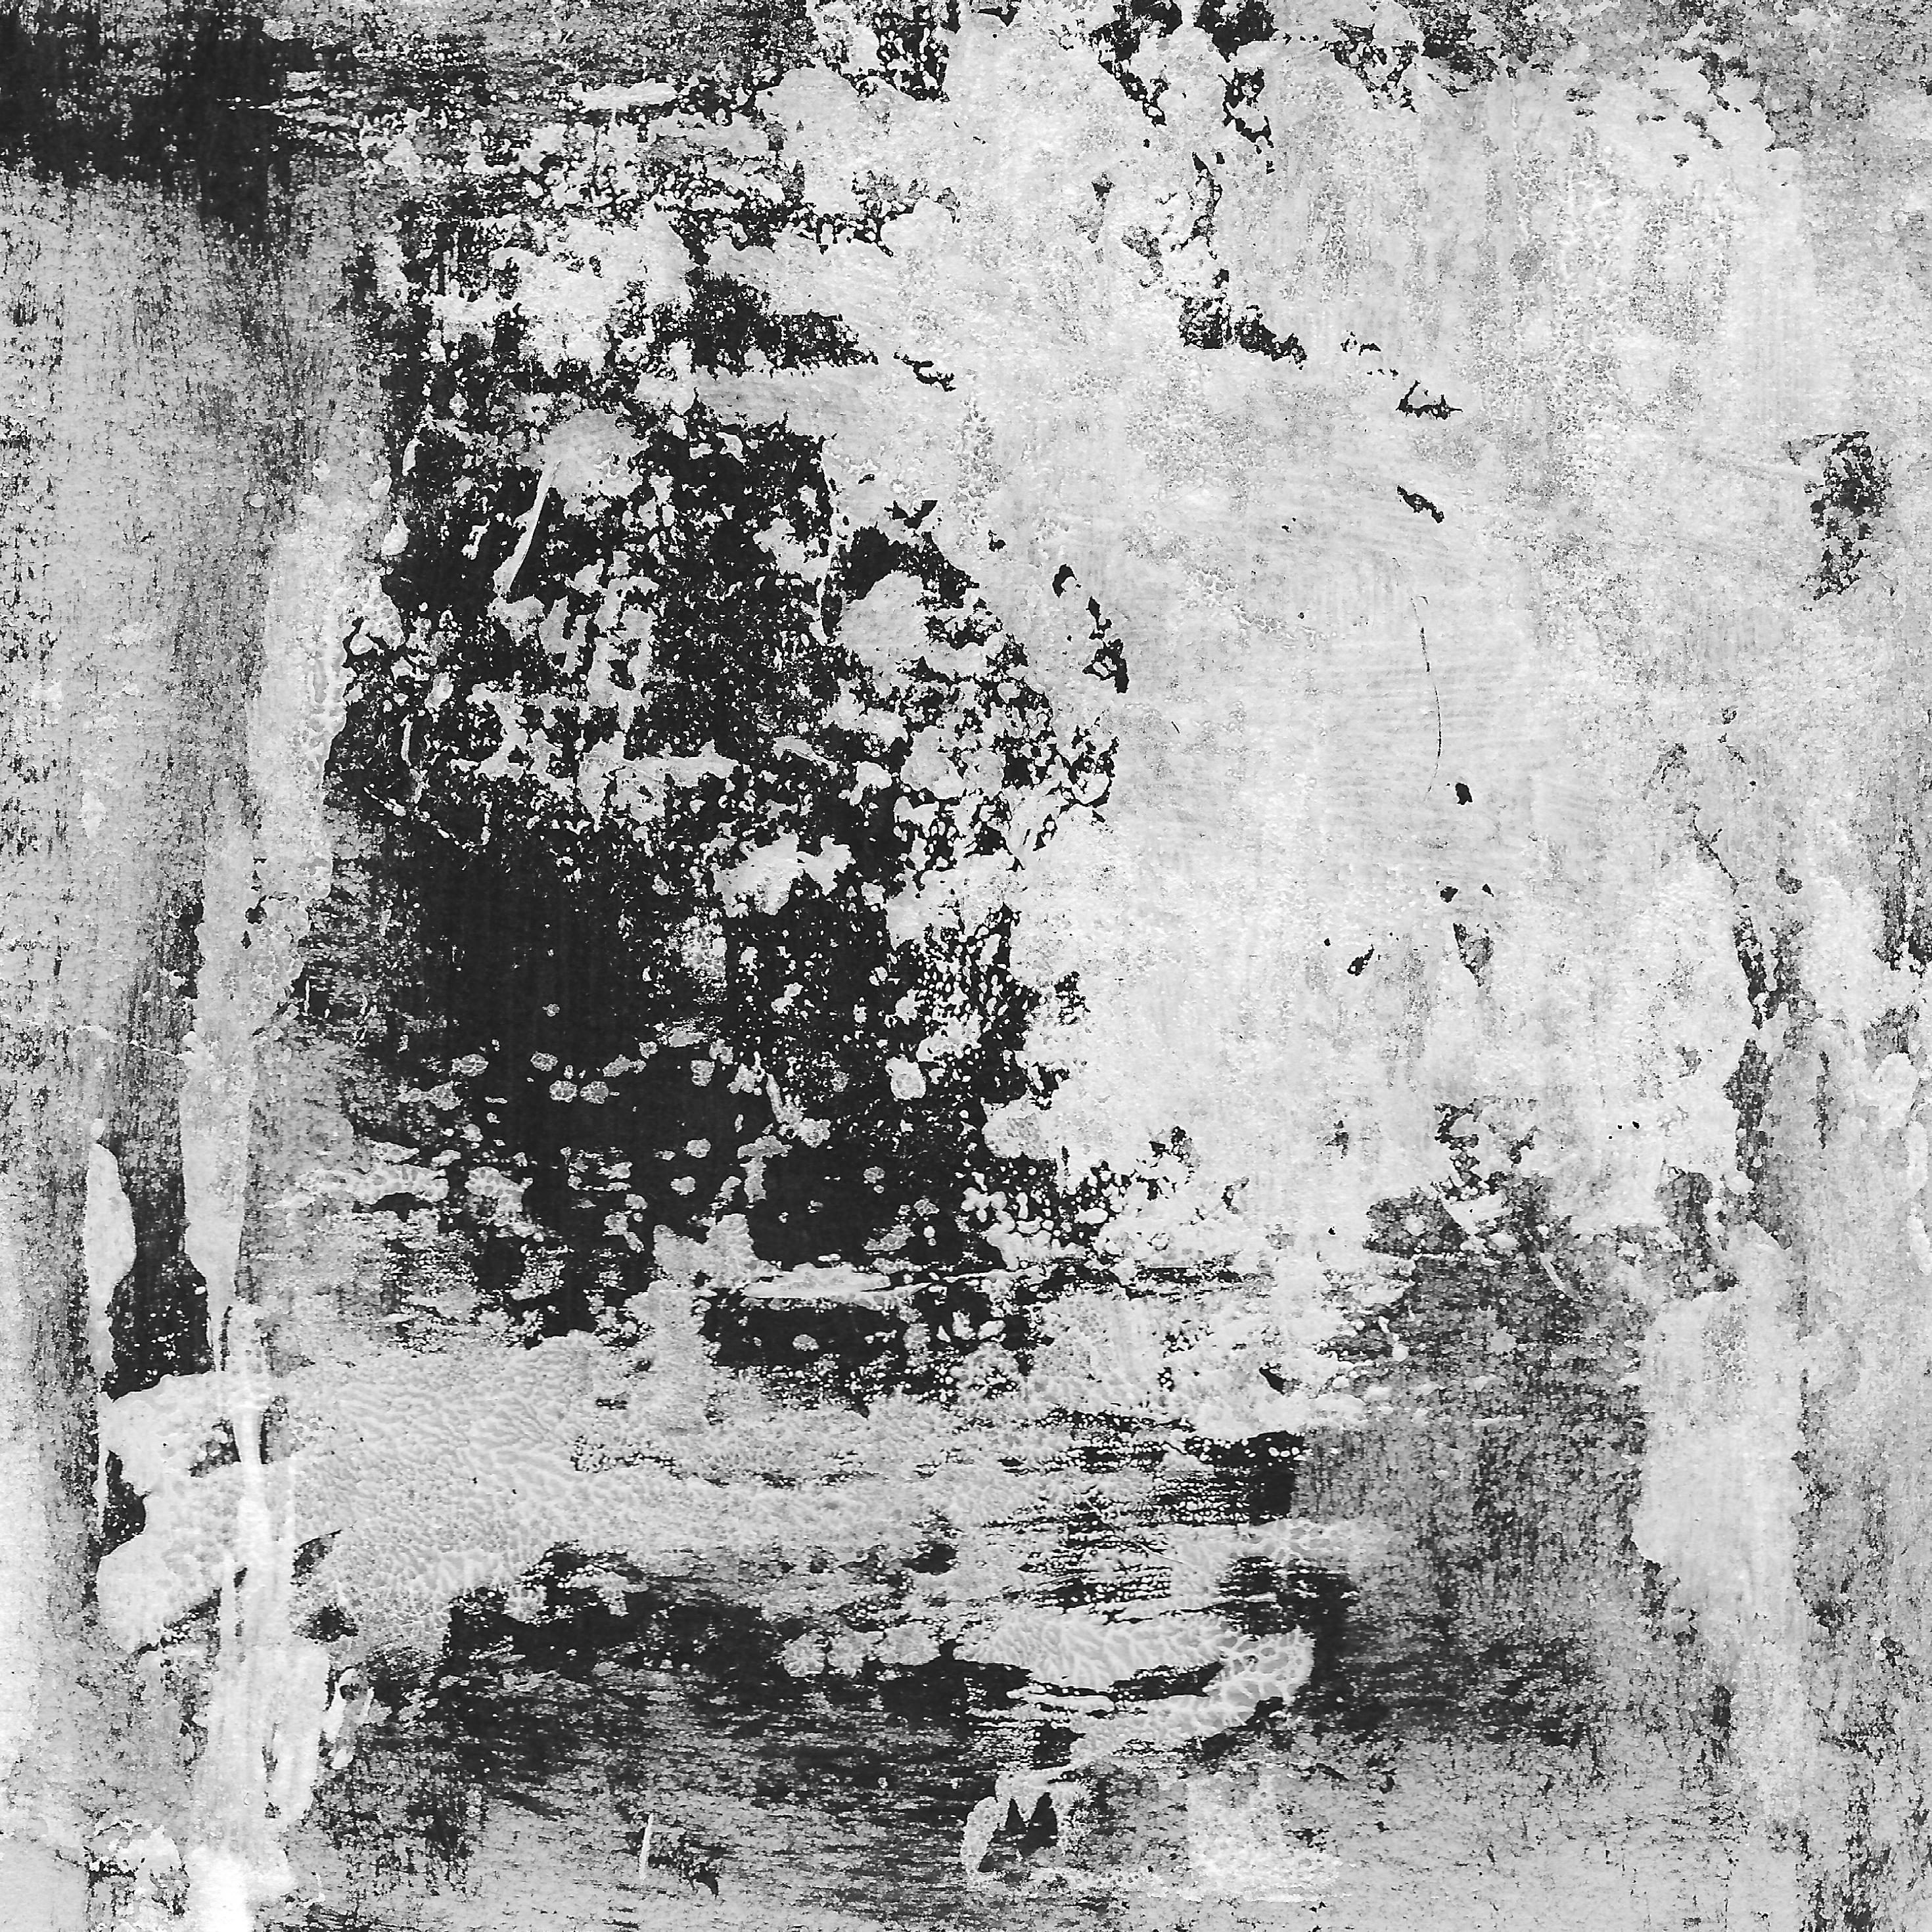 Number 134 (2017)